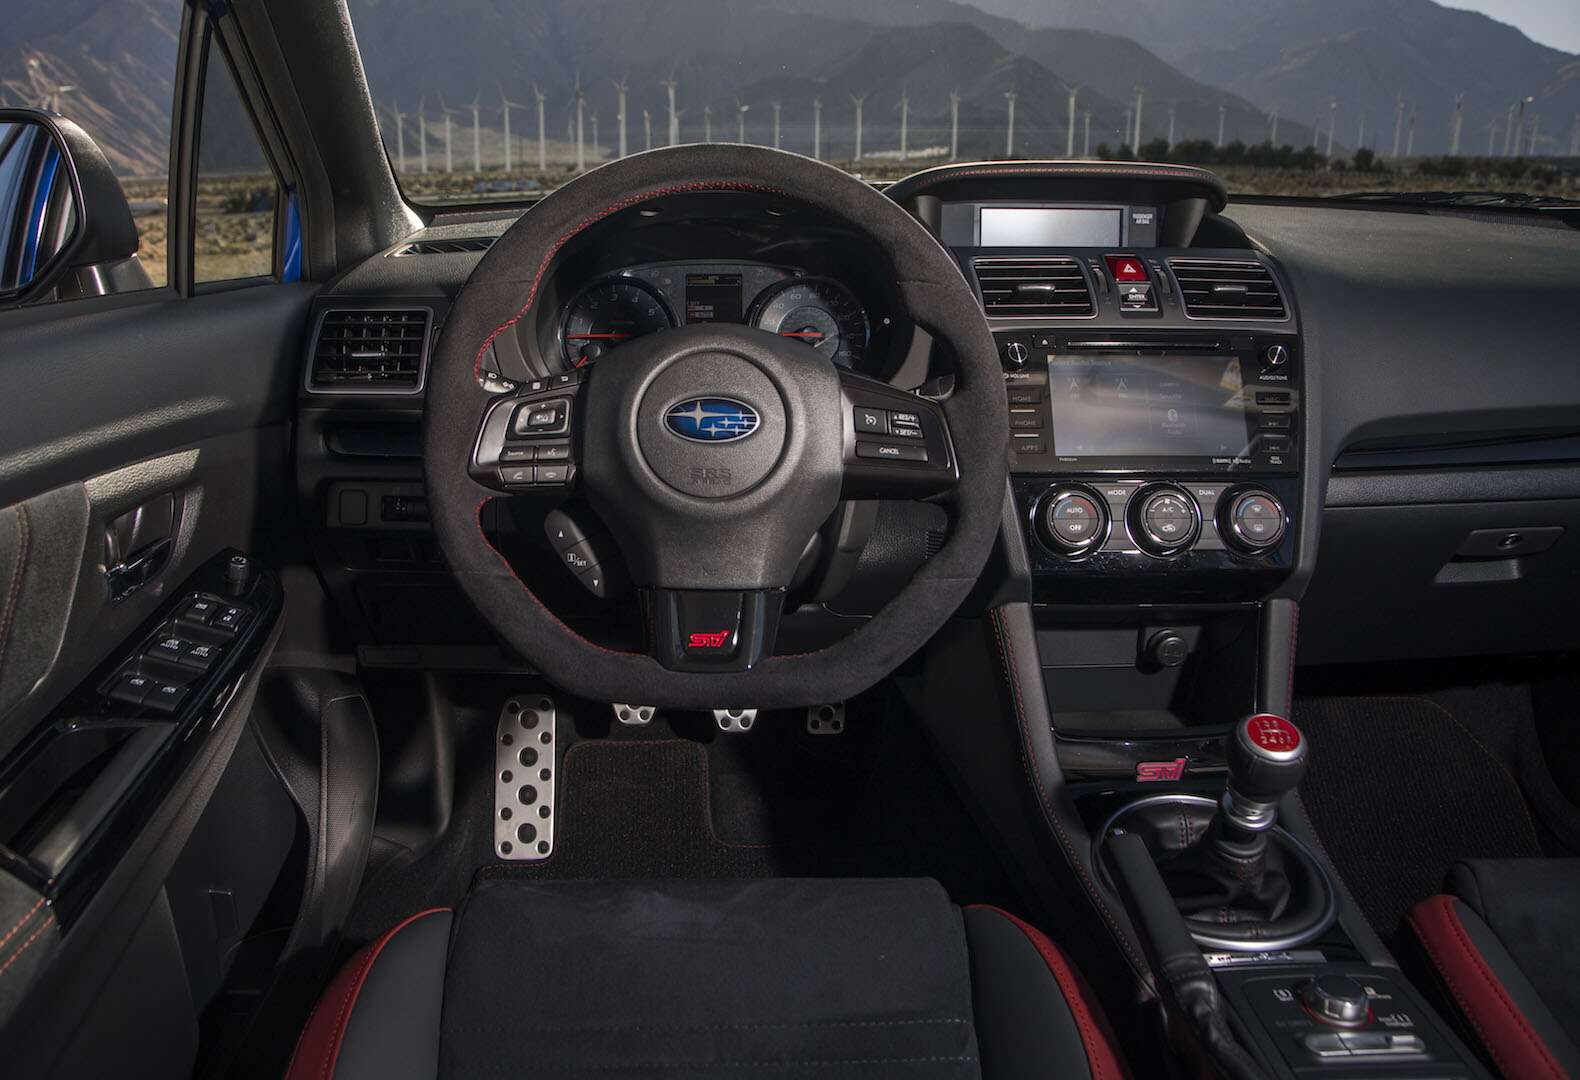 2018 Subaru WRX STI Type RA Test Drive Review - Willowdale